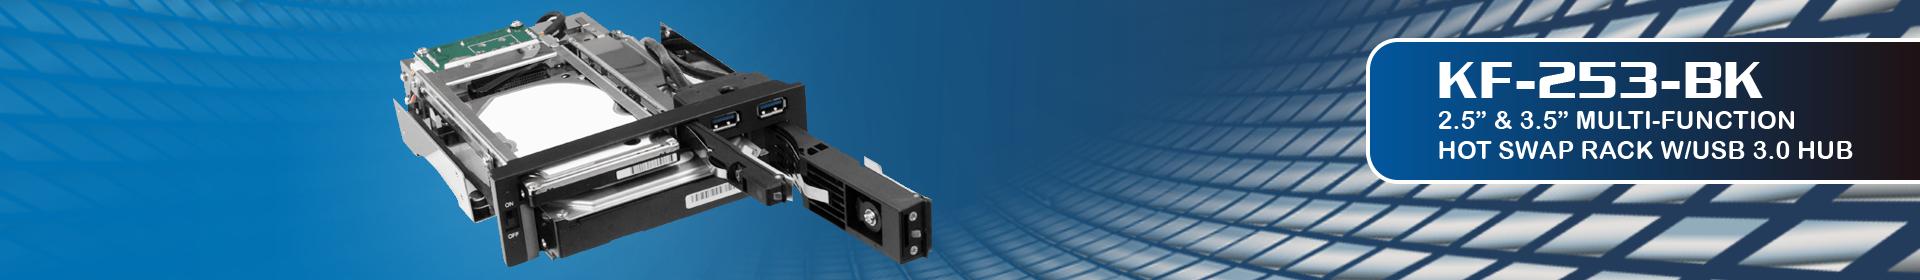 KF-253-BK_Product_Header